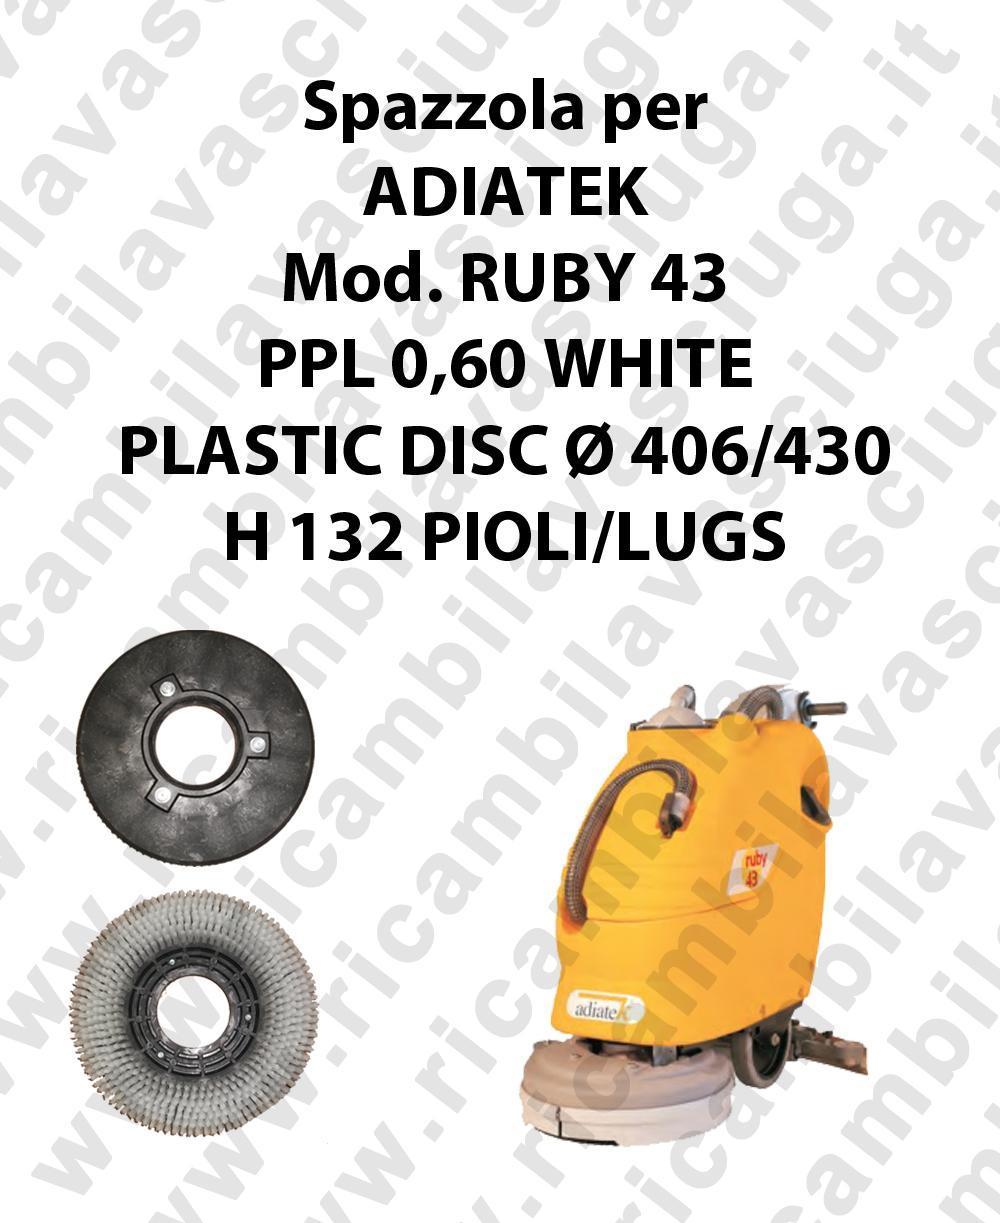 BROSSE A LAVER PPL 0,60 WHITE pour autolaveuses ADIATEK Reference RUBY 43